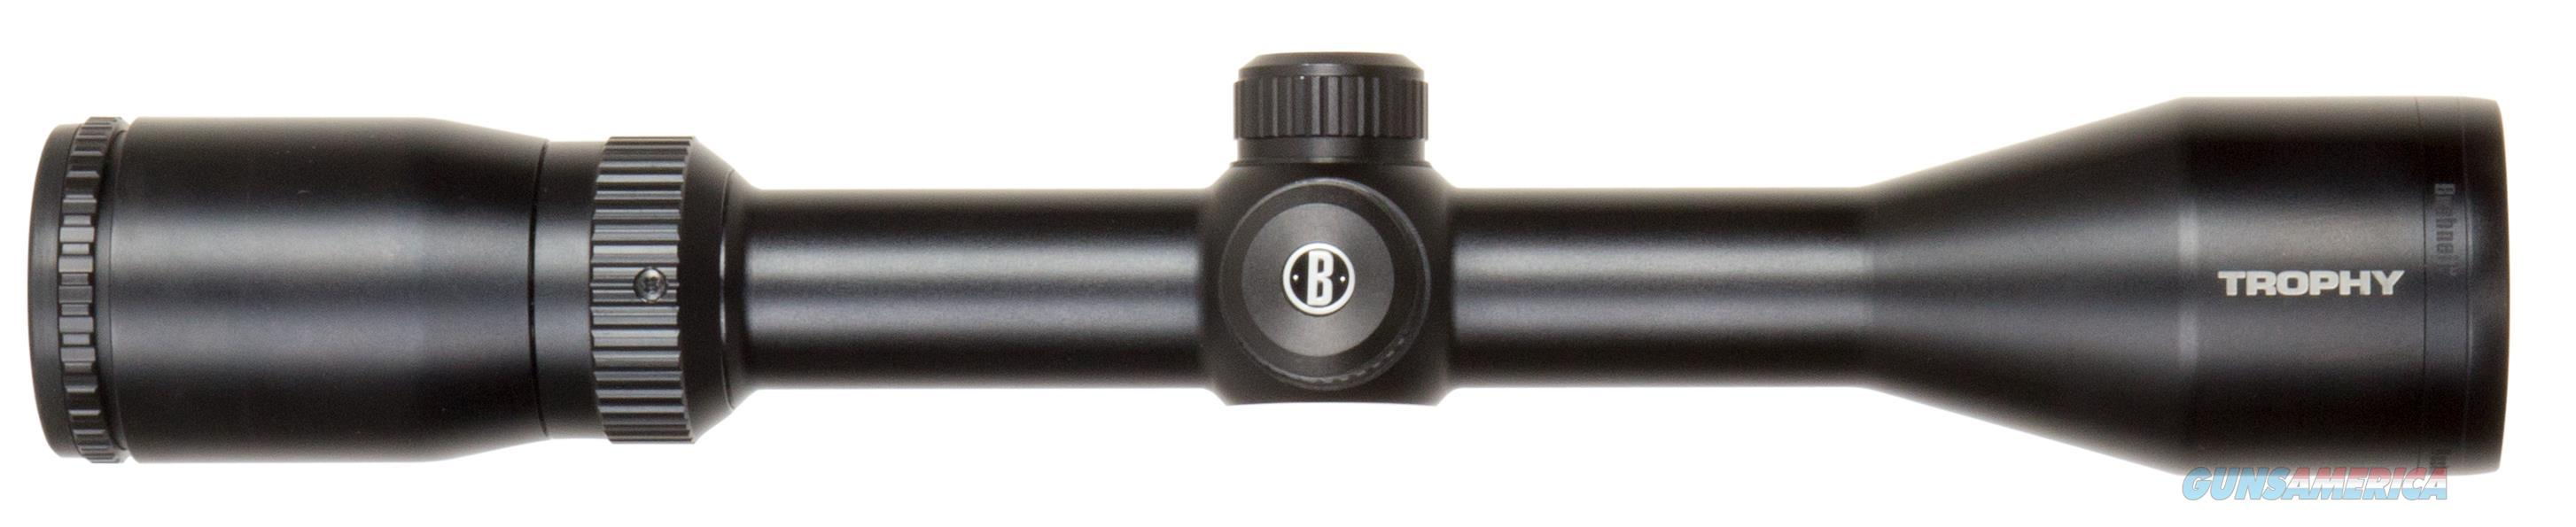 "Bushnell 753960 Trophy 3-9X 40Mm Obj 38-13 Ft @ 100 Yds Fov 1"" Tube Dia Black Matte Multi-X 753960  Non-Guns > Scopes/Mounts/Rings & Optics > Rifle Scopes > Variable Focal Length"